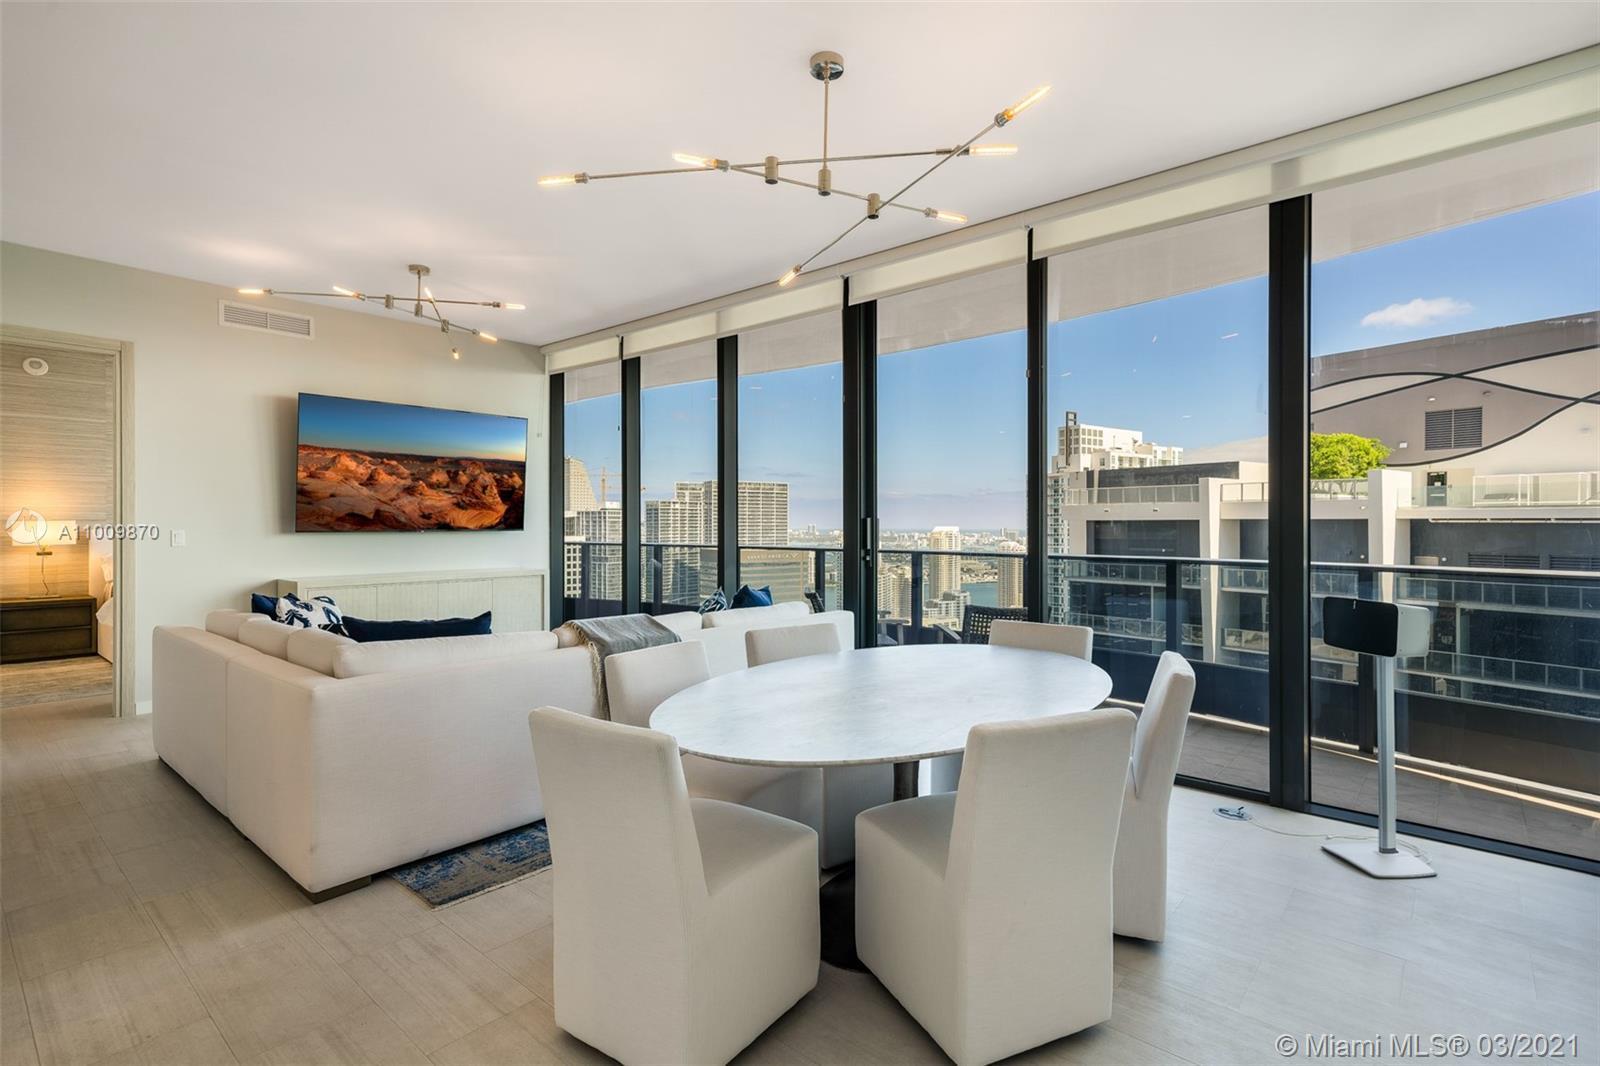 Brickell FlatIron #PH5005 - 1000 Brickell Plz #PH5005, Miami, FL 33131